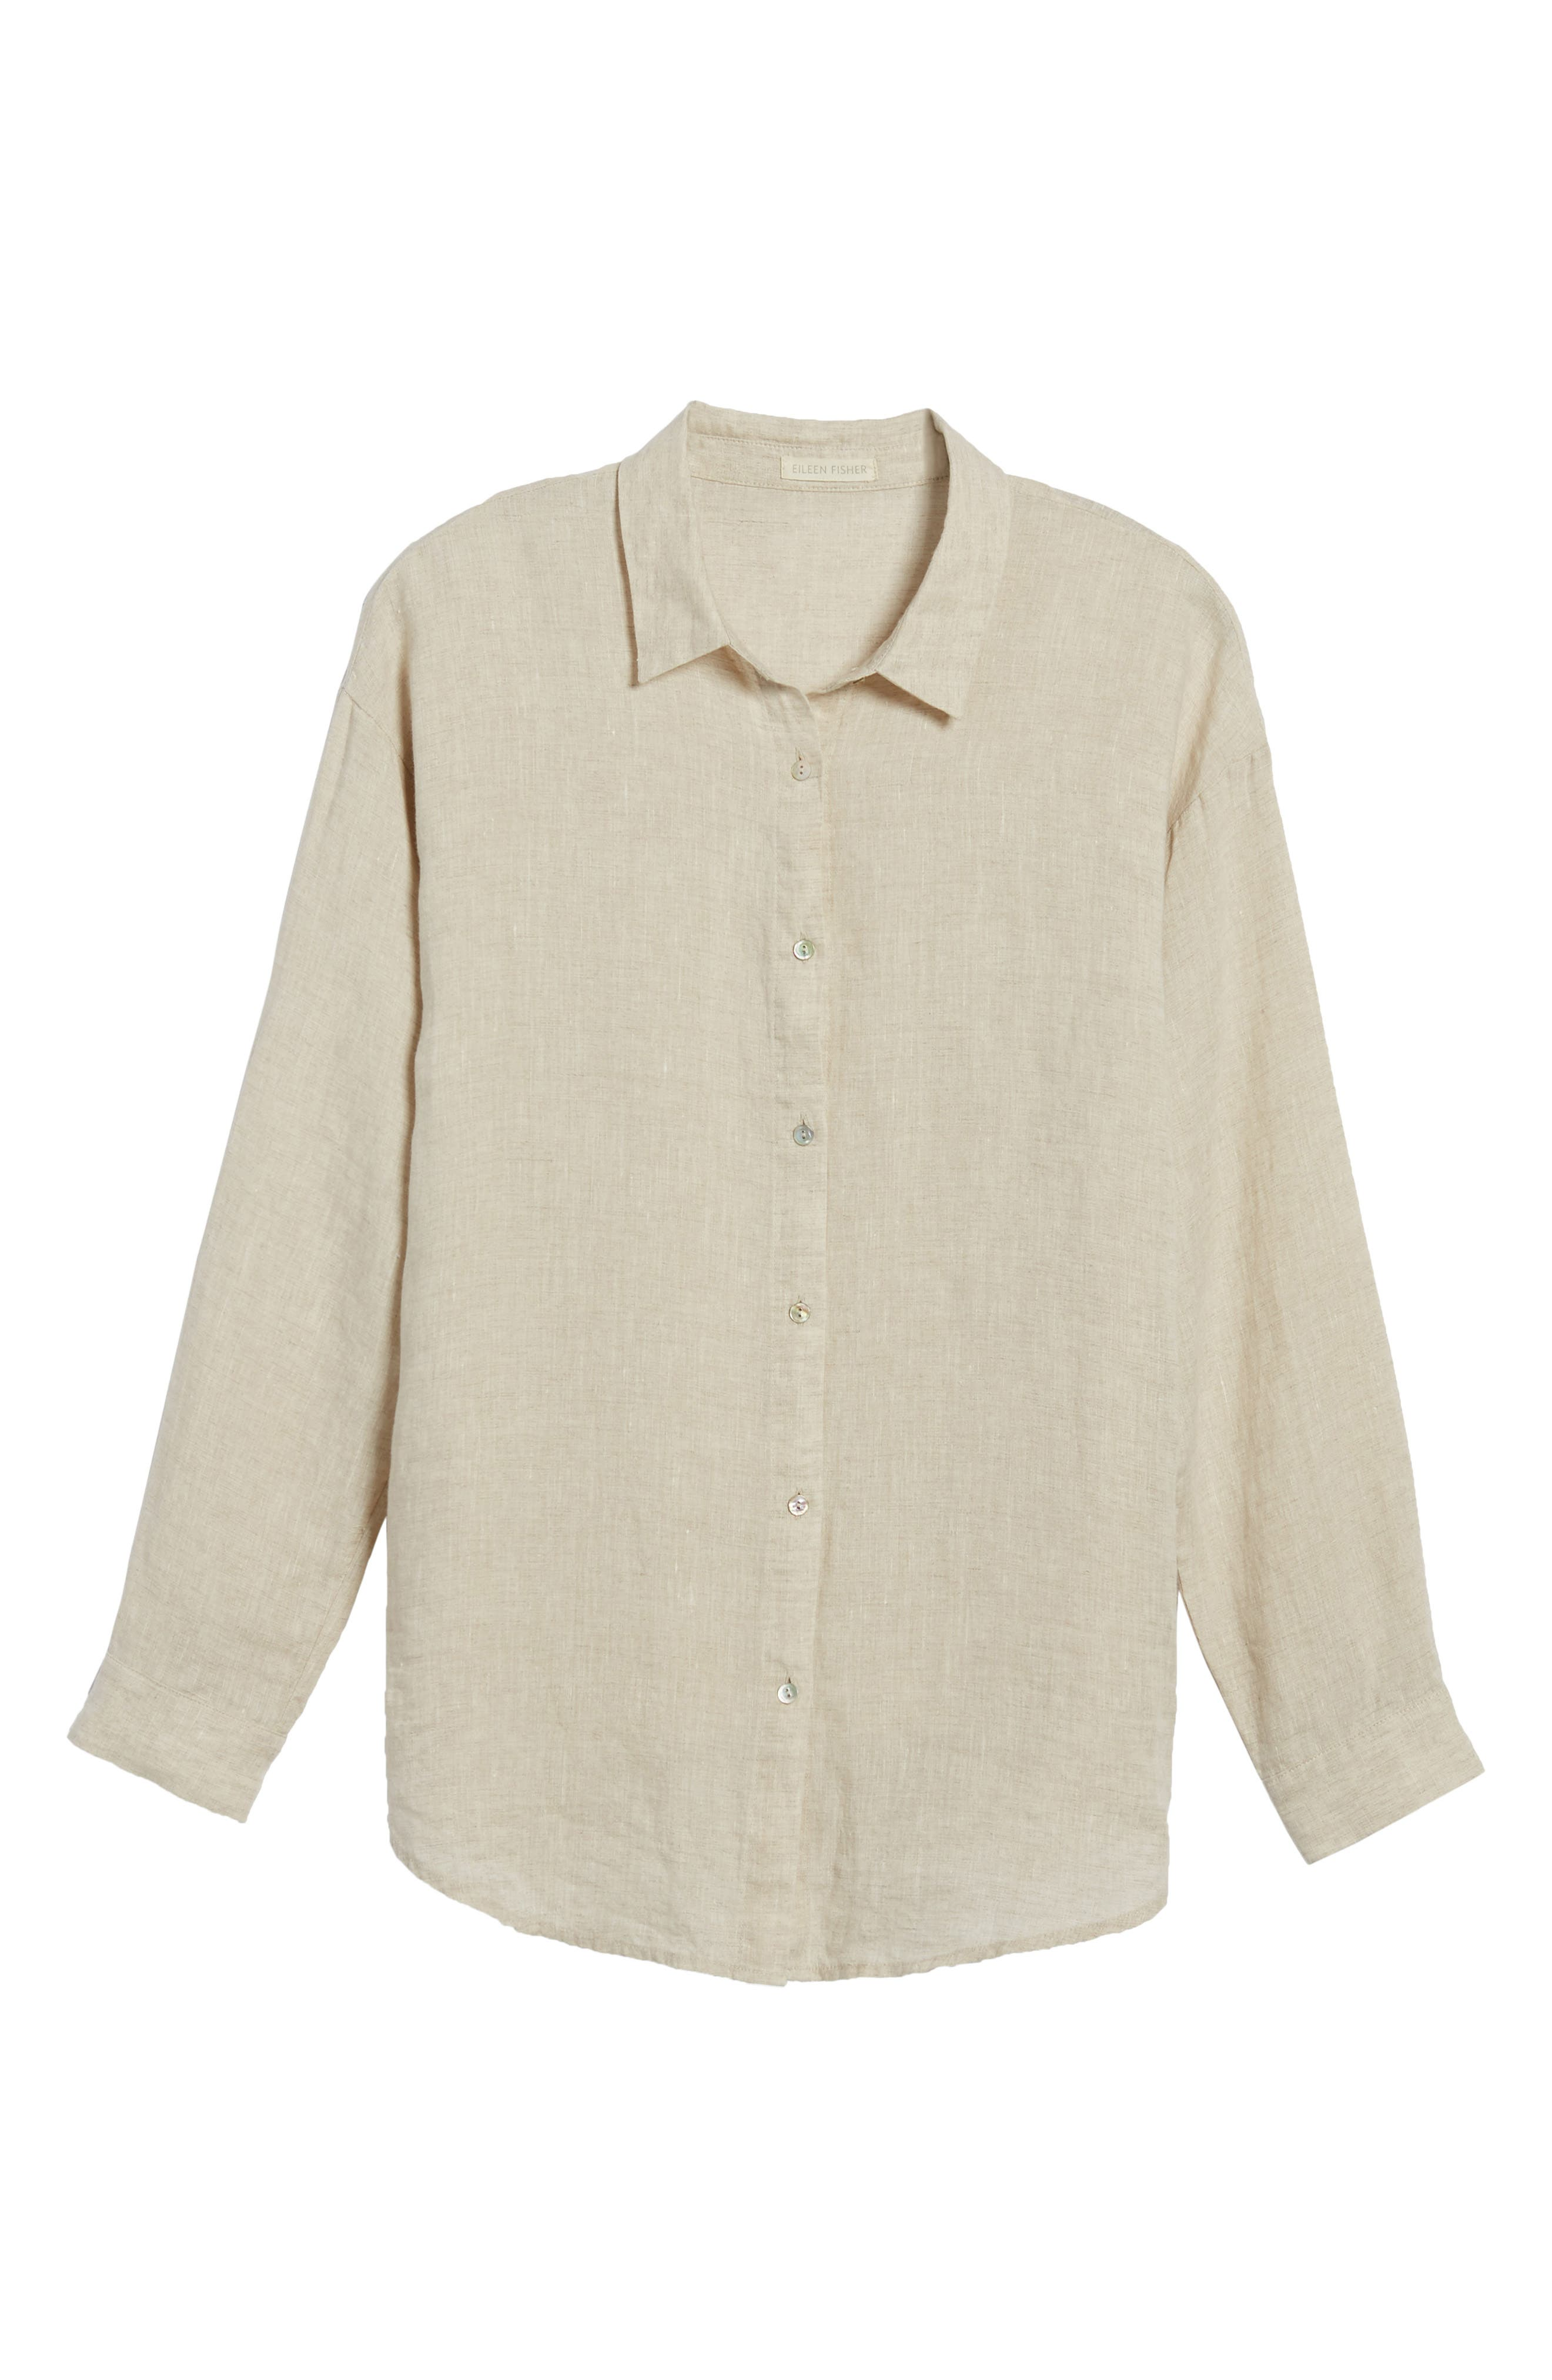 Organic Linen Shirt,                             Alternate thumbnail 7, color,                             257